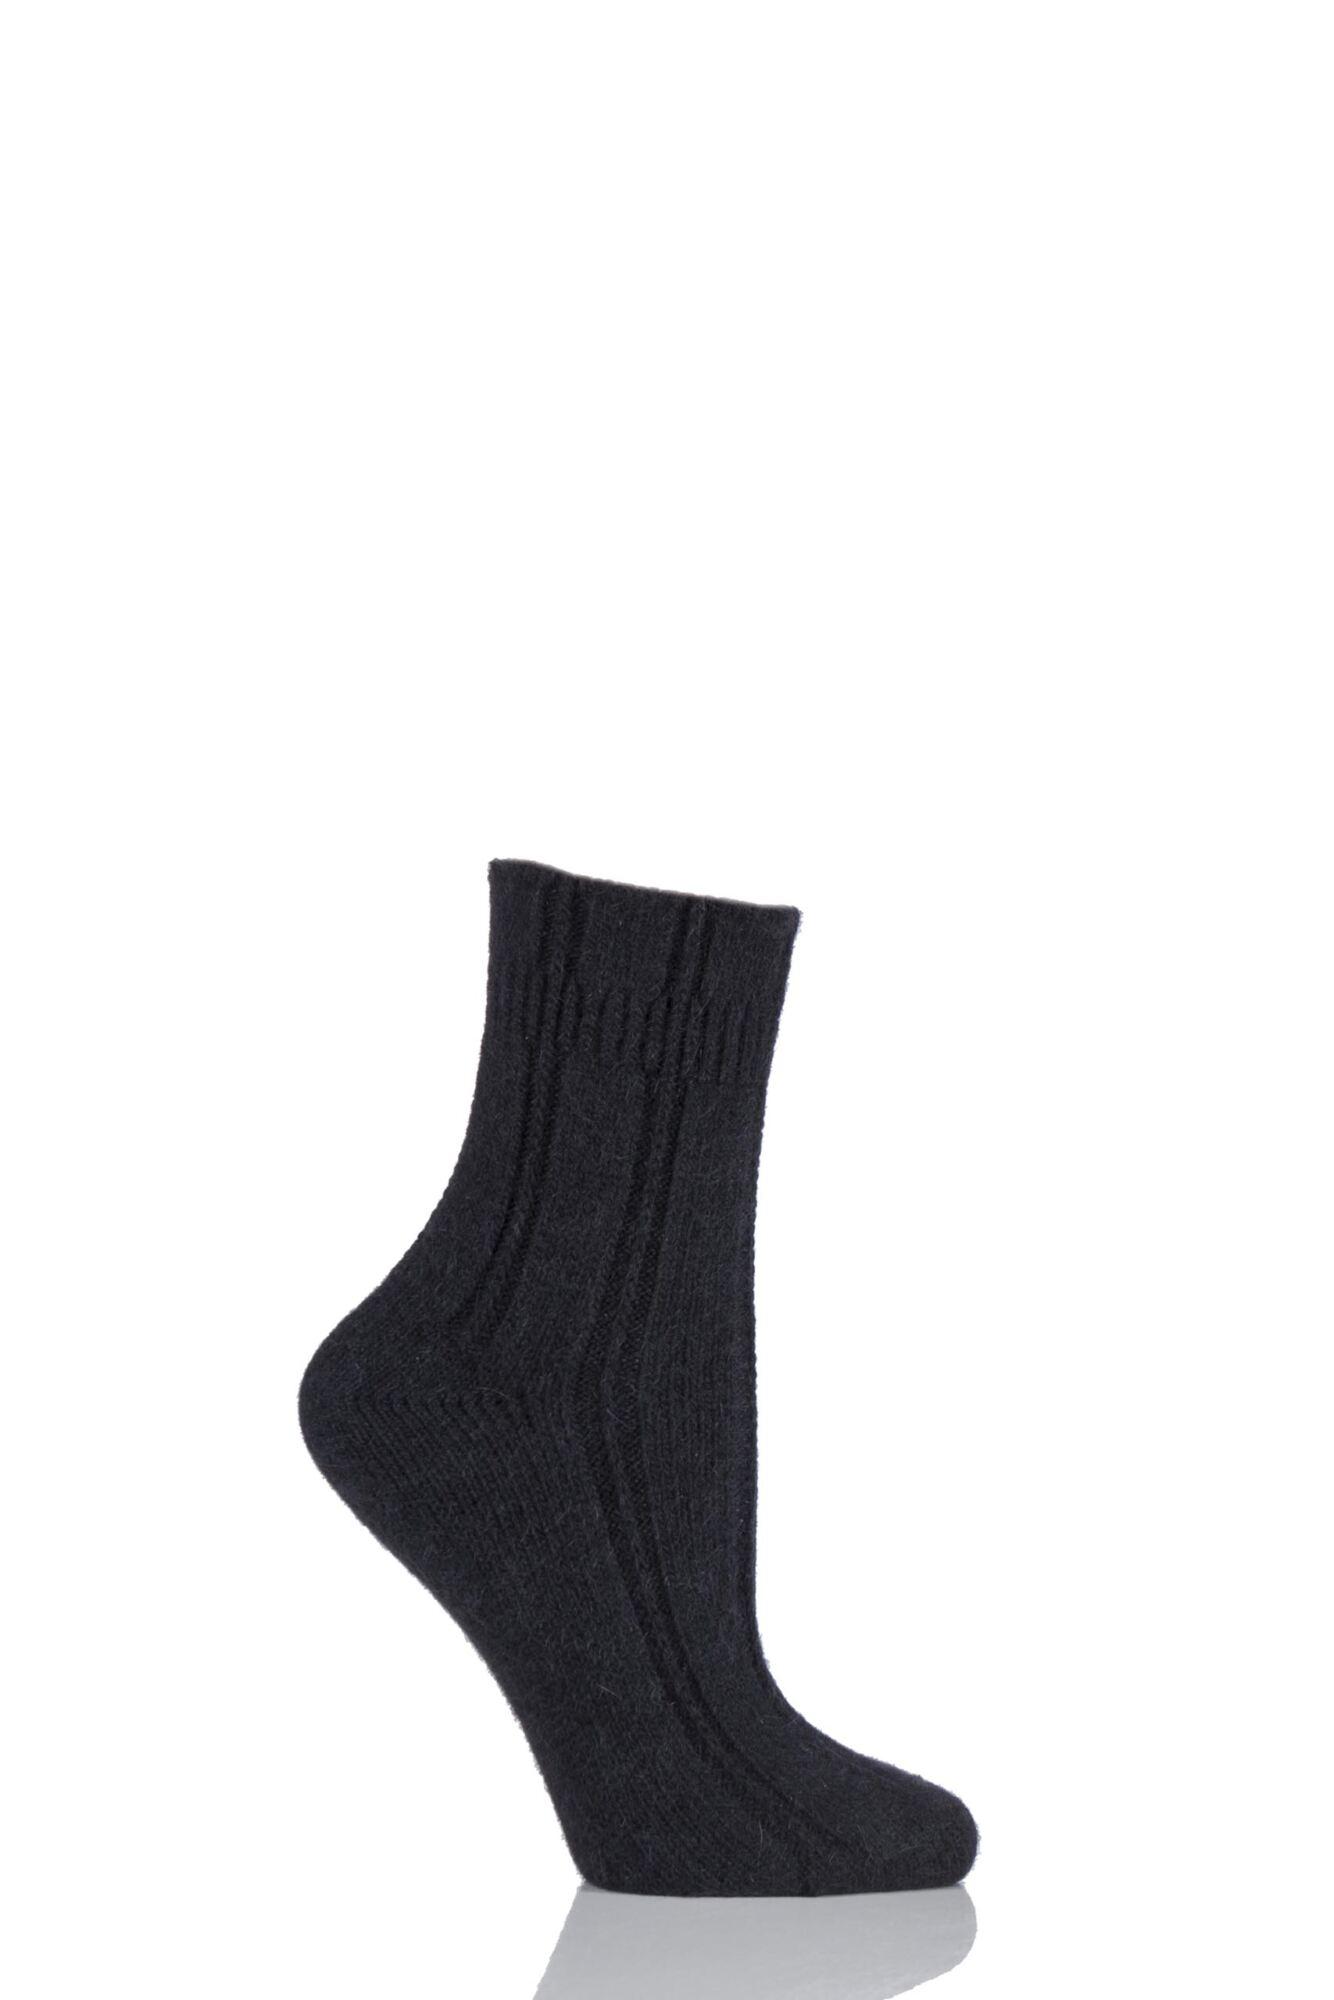 1 Pair Angora Bed Socks Ladies - Falke